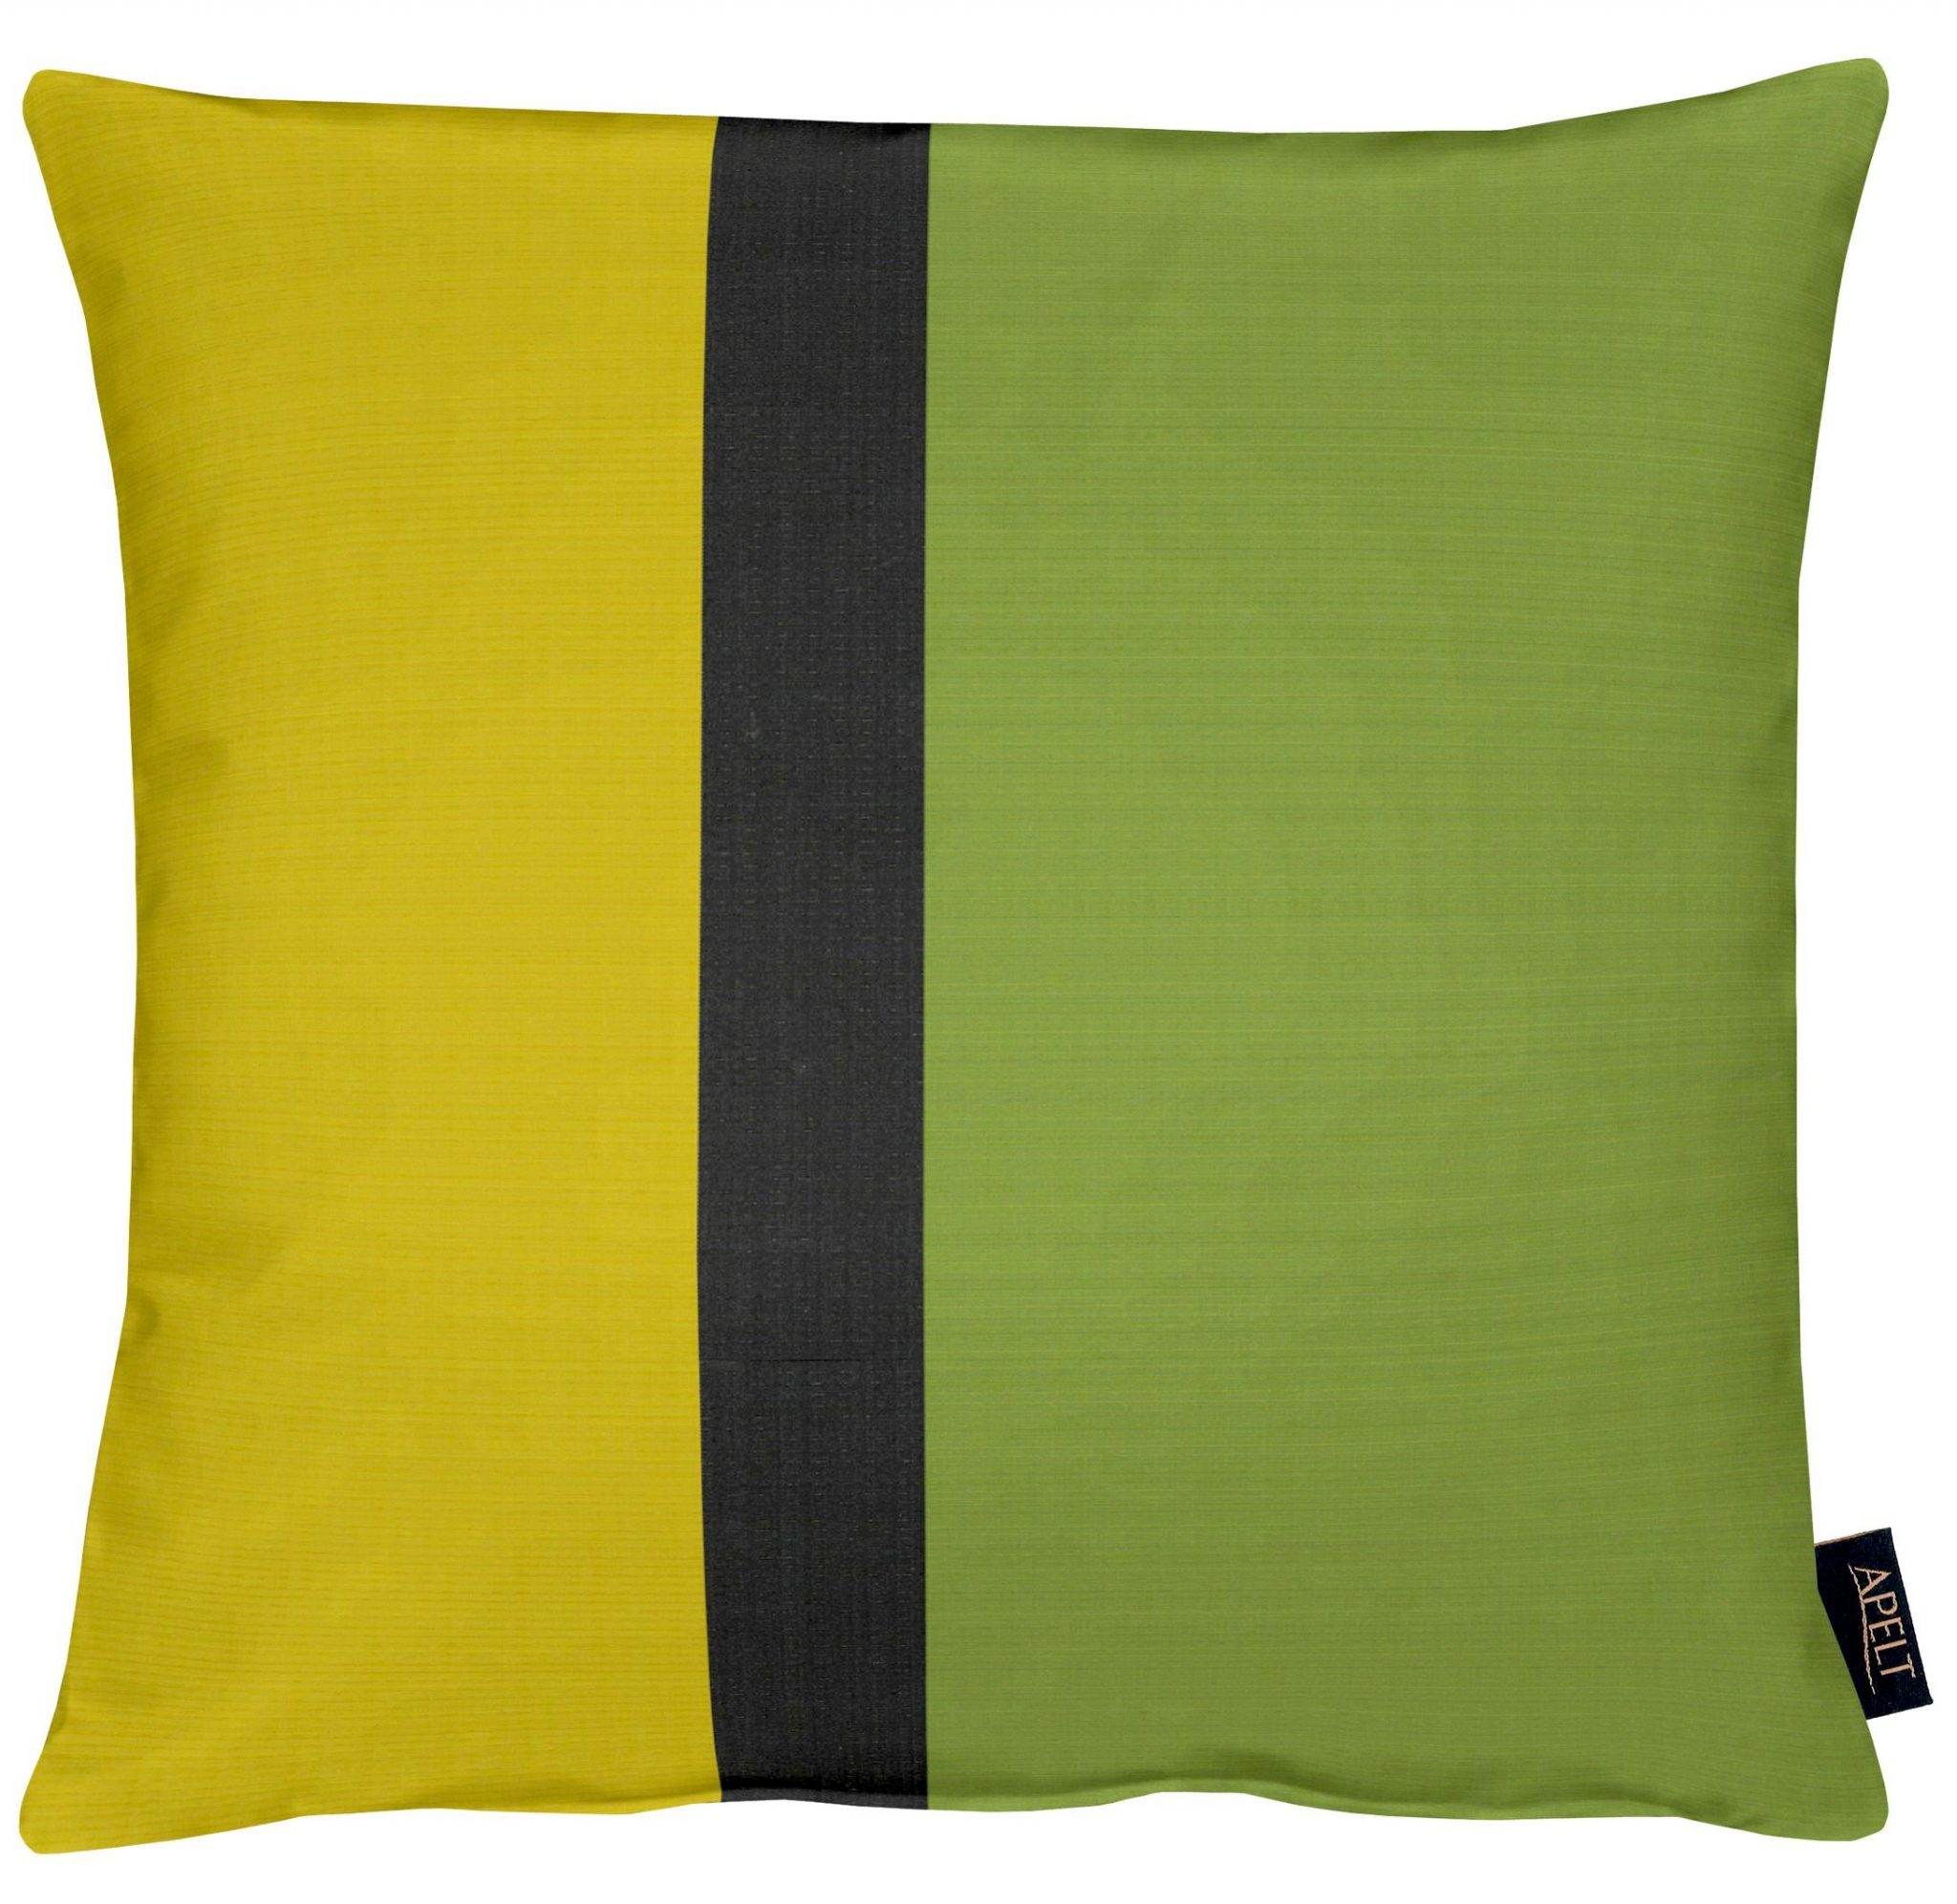 Dekokissen Apelt TASMAN grün gelb 45x45